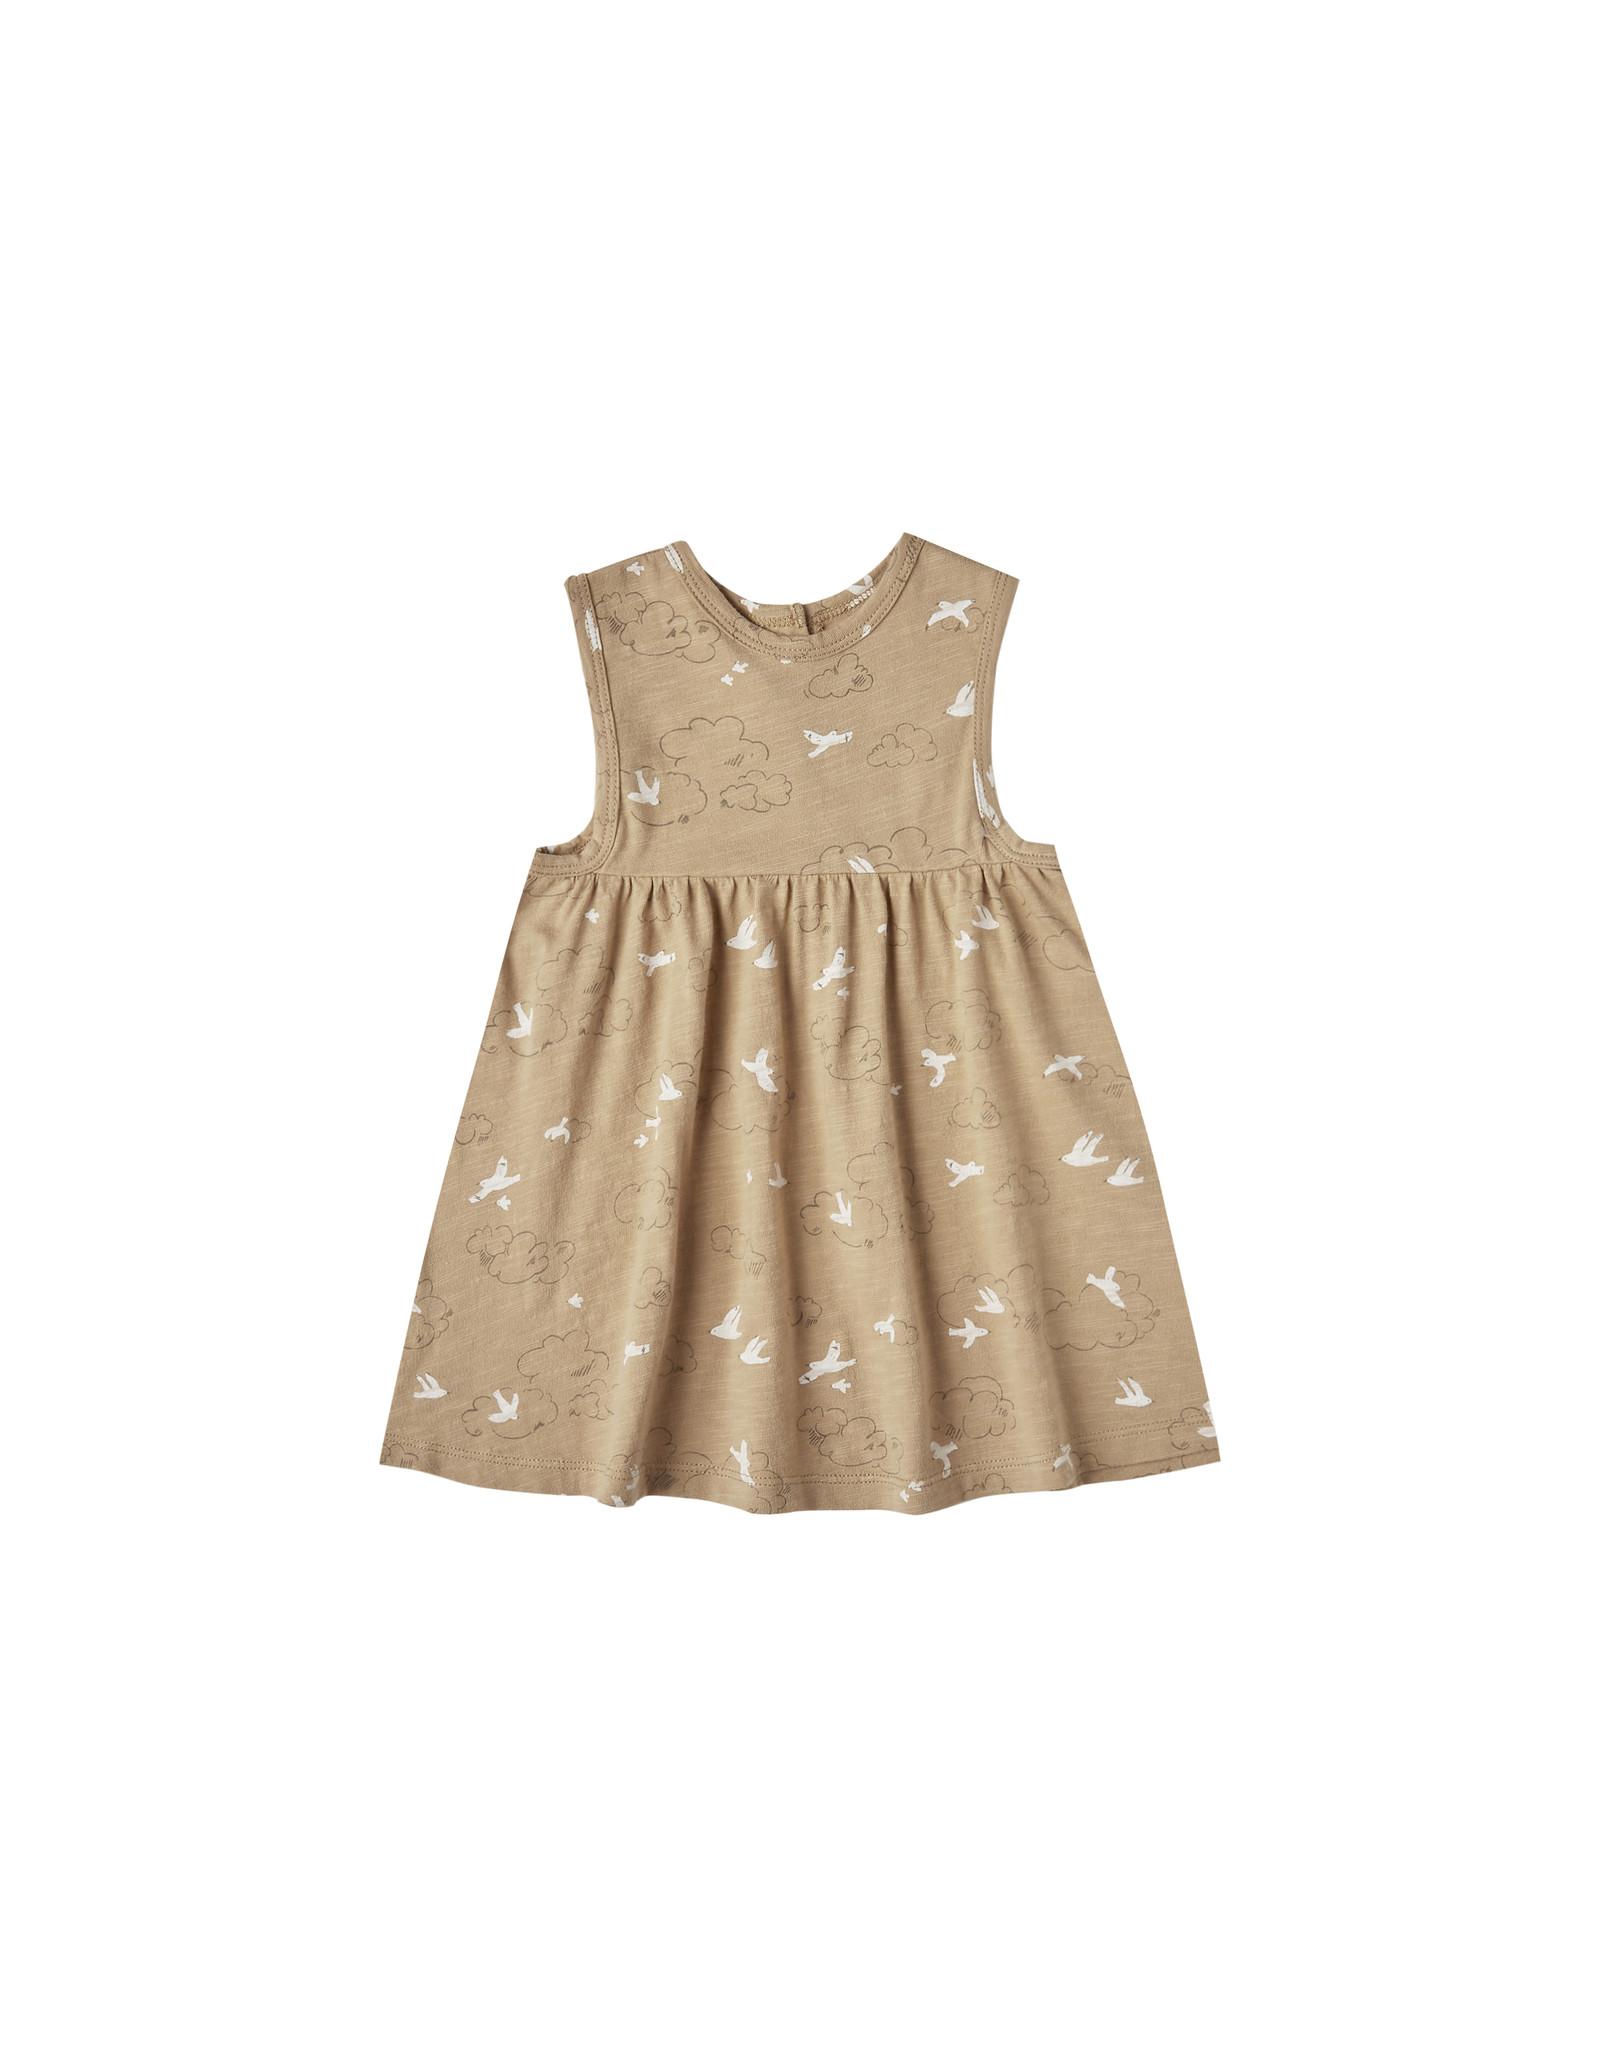 Rylee and Cru Clouds Layla mini dress